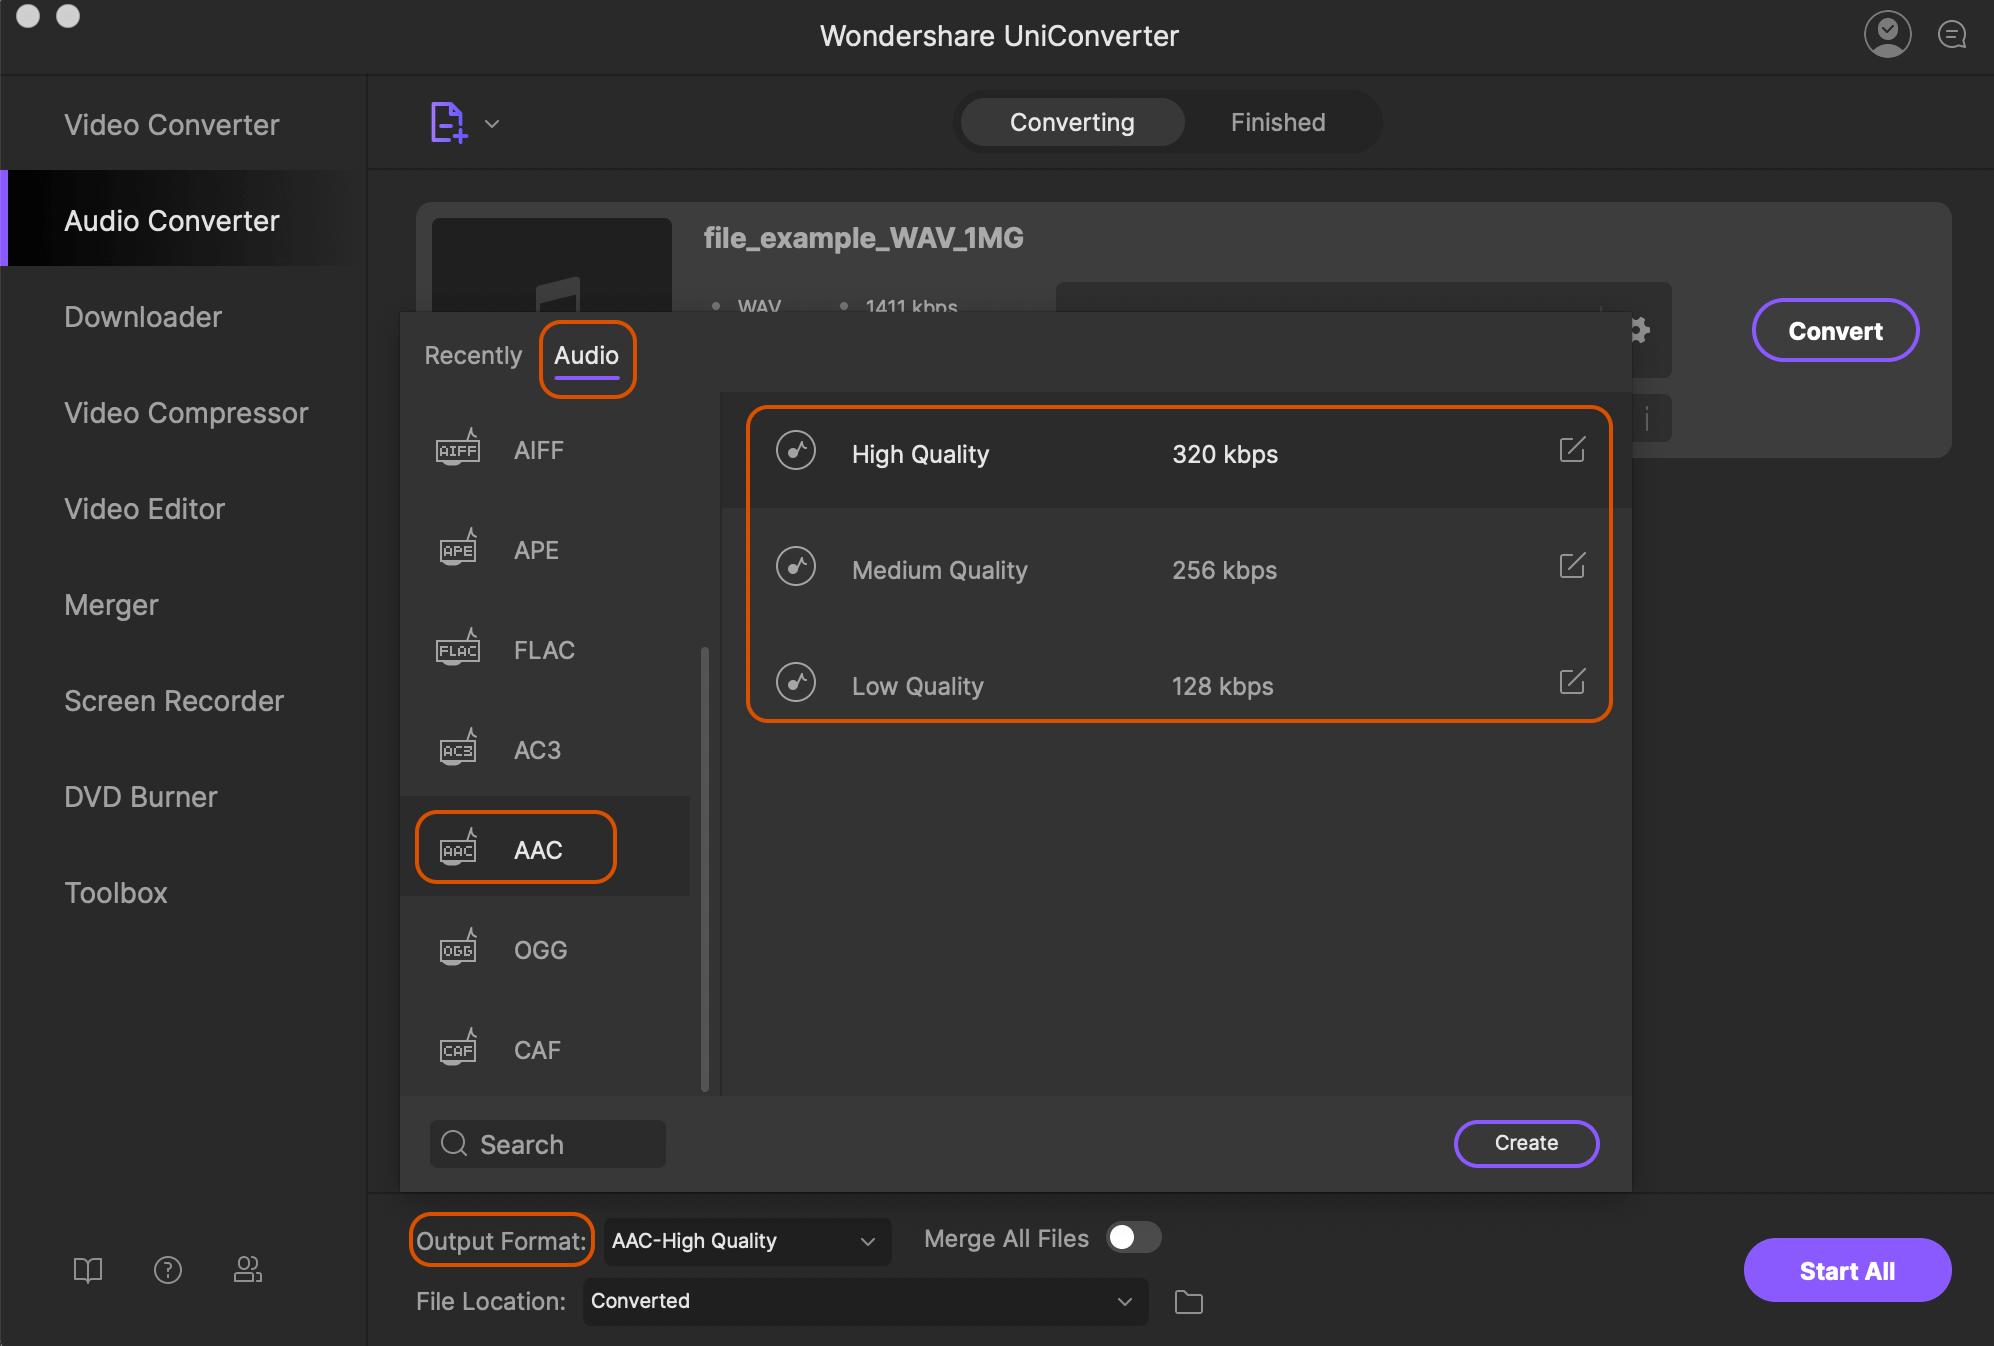 WAV to AAC: How to Convert WAV to AAC Format in iTunes